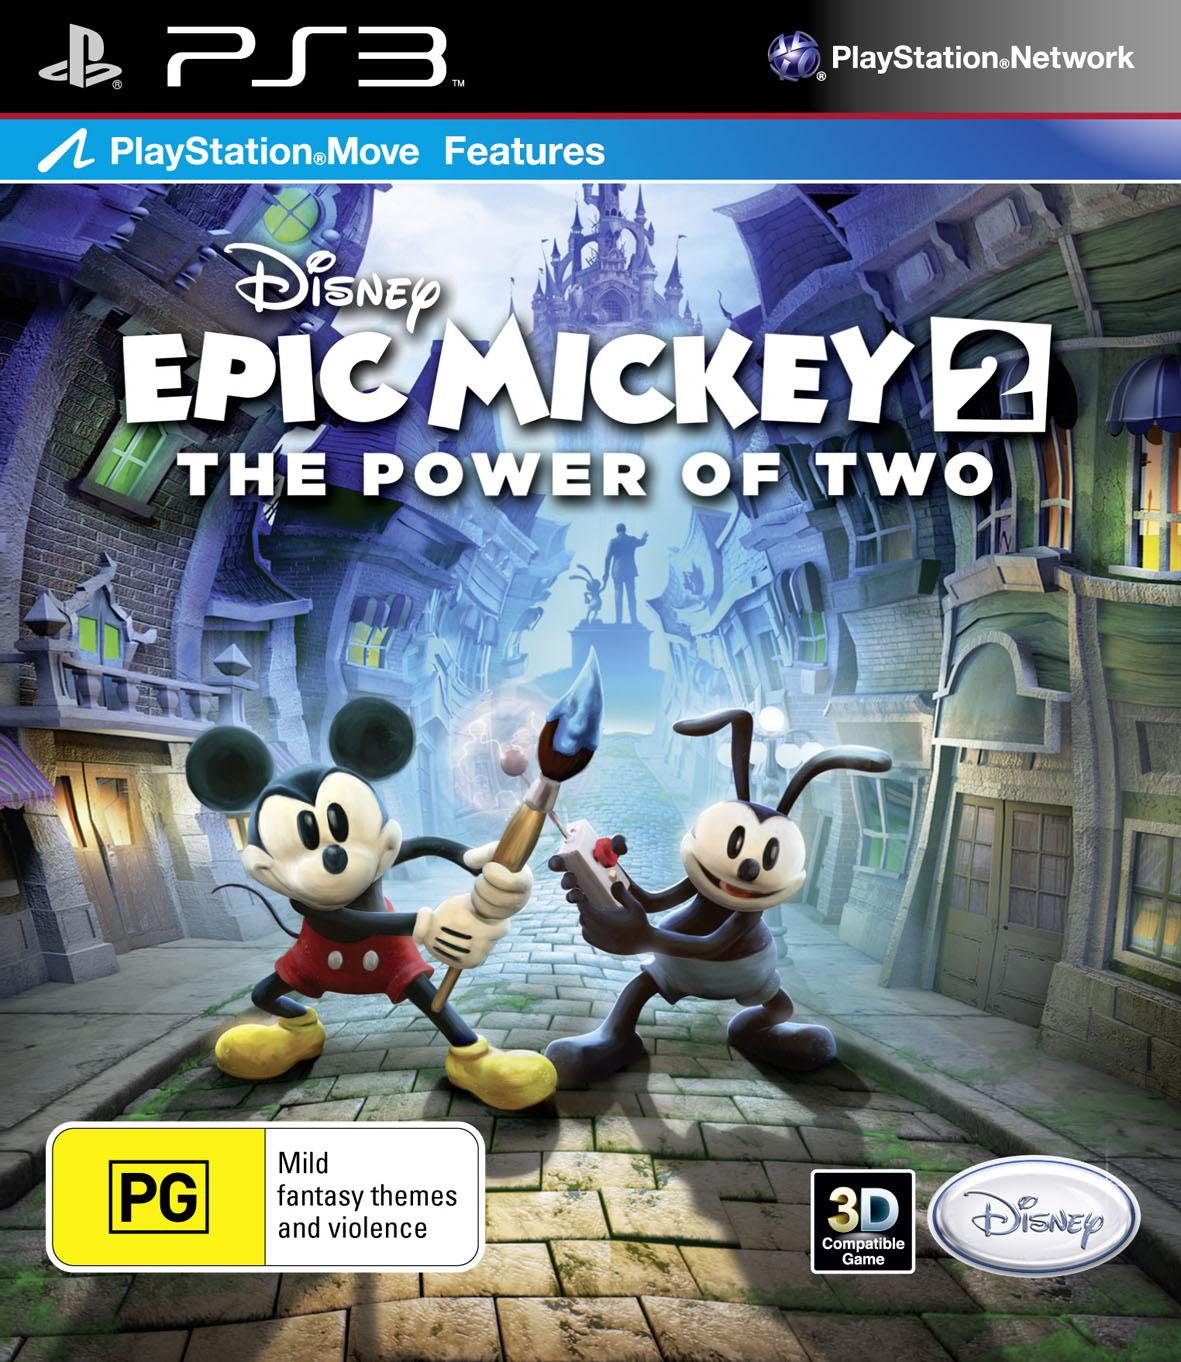 http://3.bp.blogspot.com/-D-cILn4ytJc/UIZEKb9GkbI/AAAAAAAAA3o/bFQ0R3hv-Ek/s1600/Epic+Mickey+2+-+00.jpg